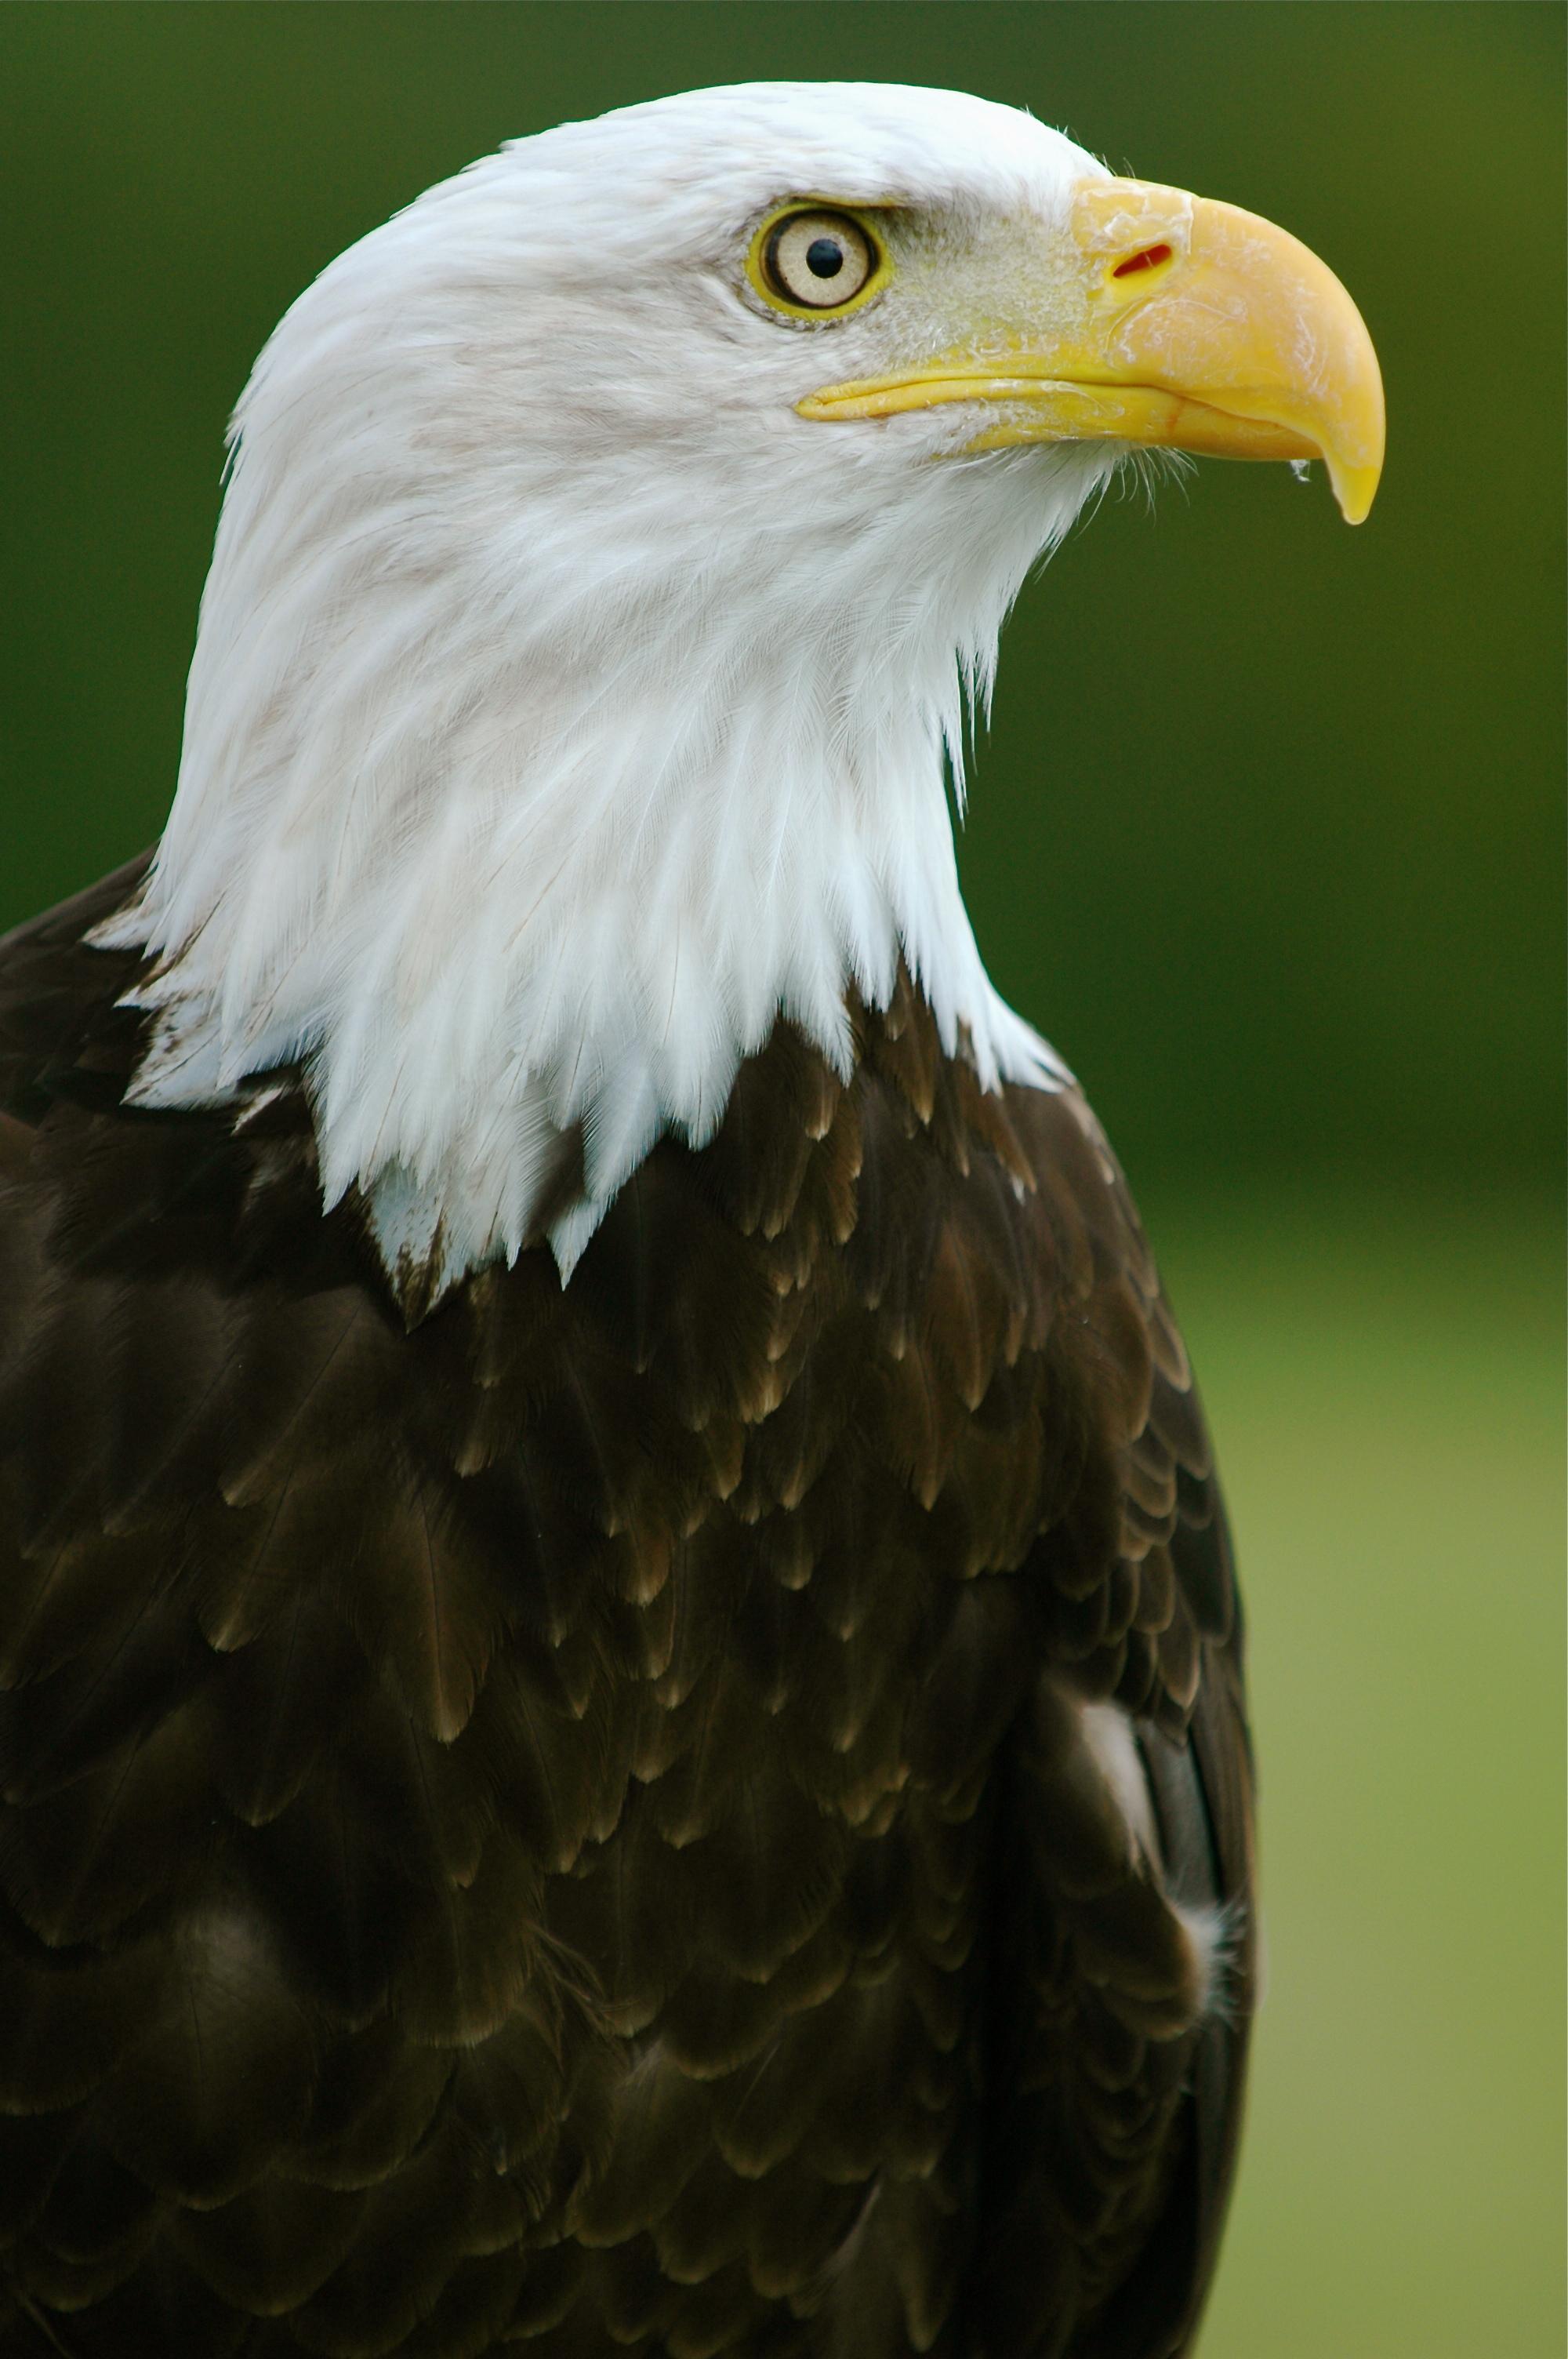 Bald Eagles | Our Urban Jungle